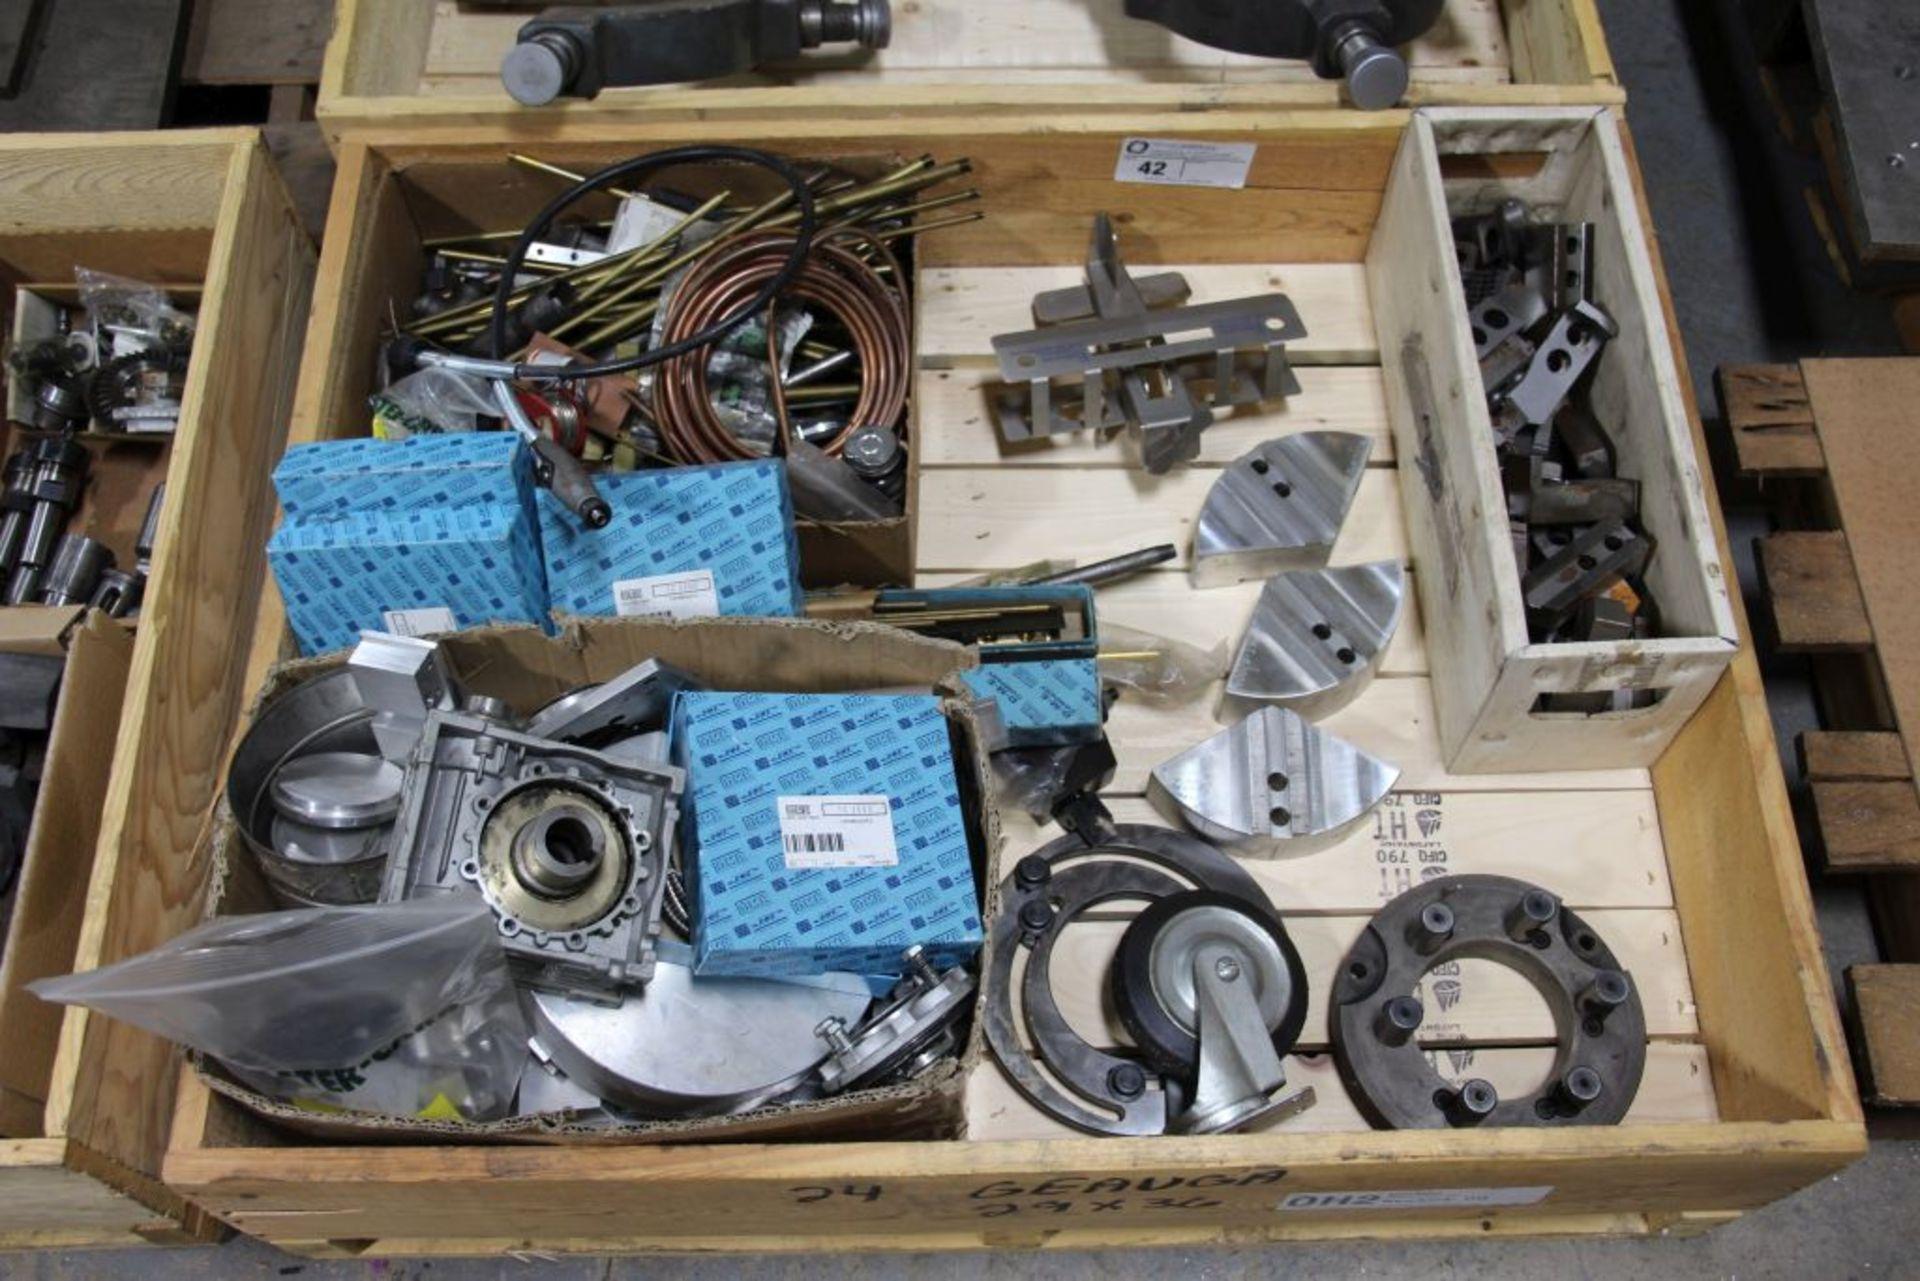 Lot 42 - assortment of aluminum stock, chuck teeth & misc.